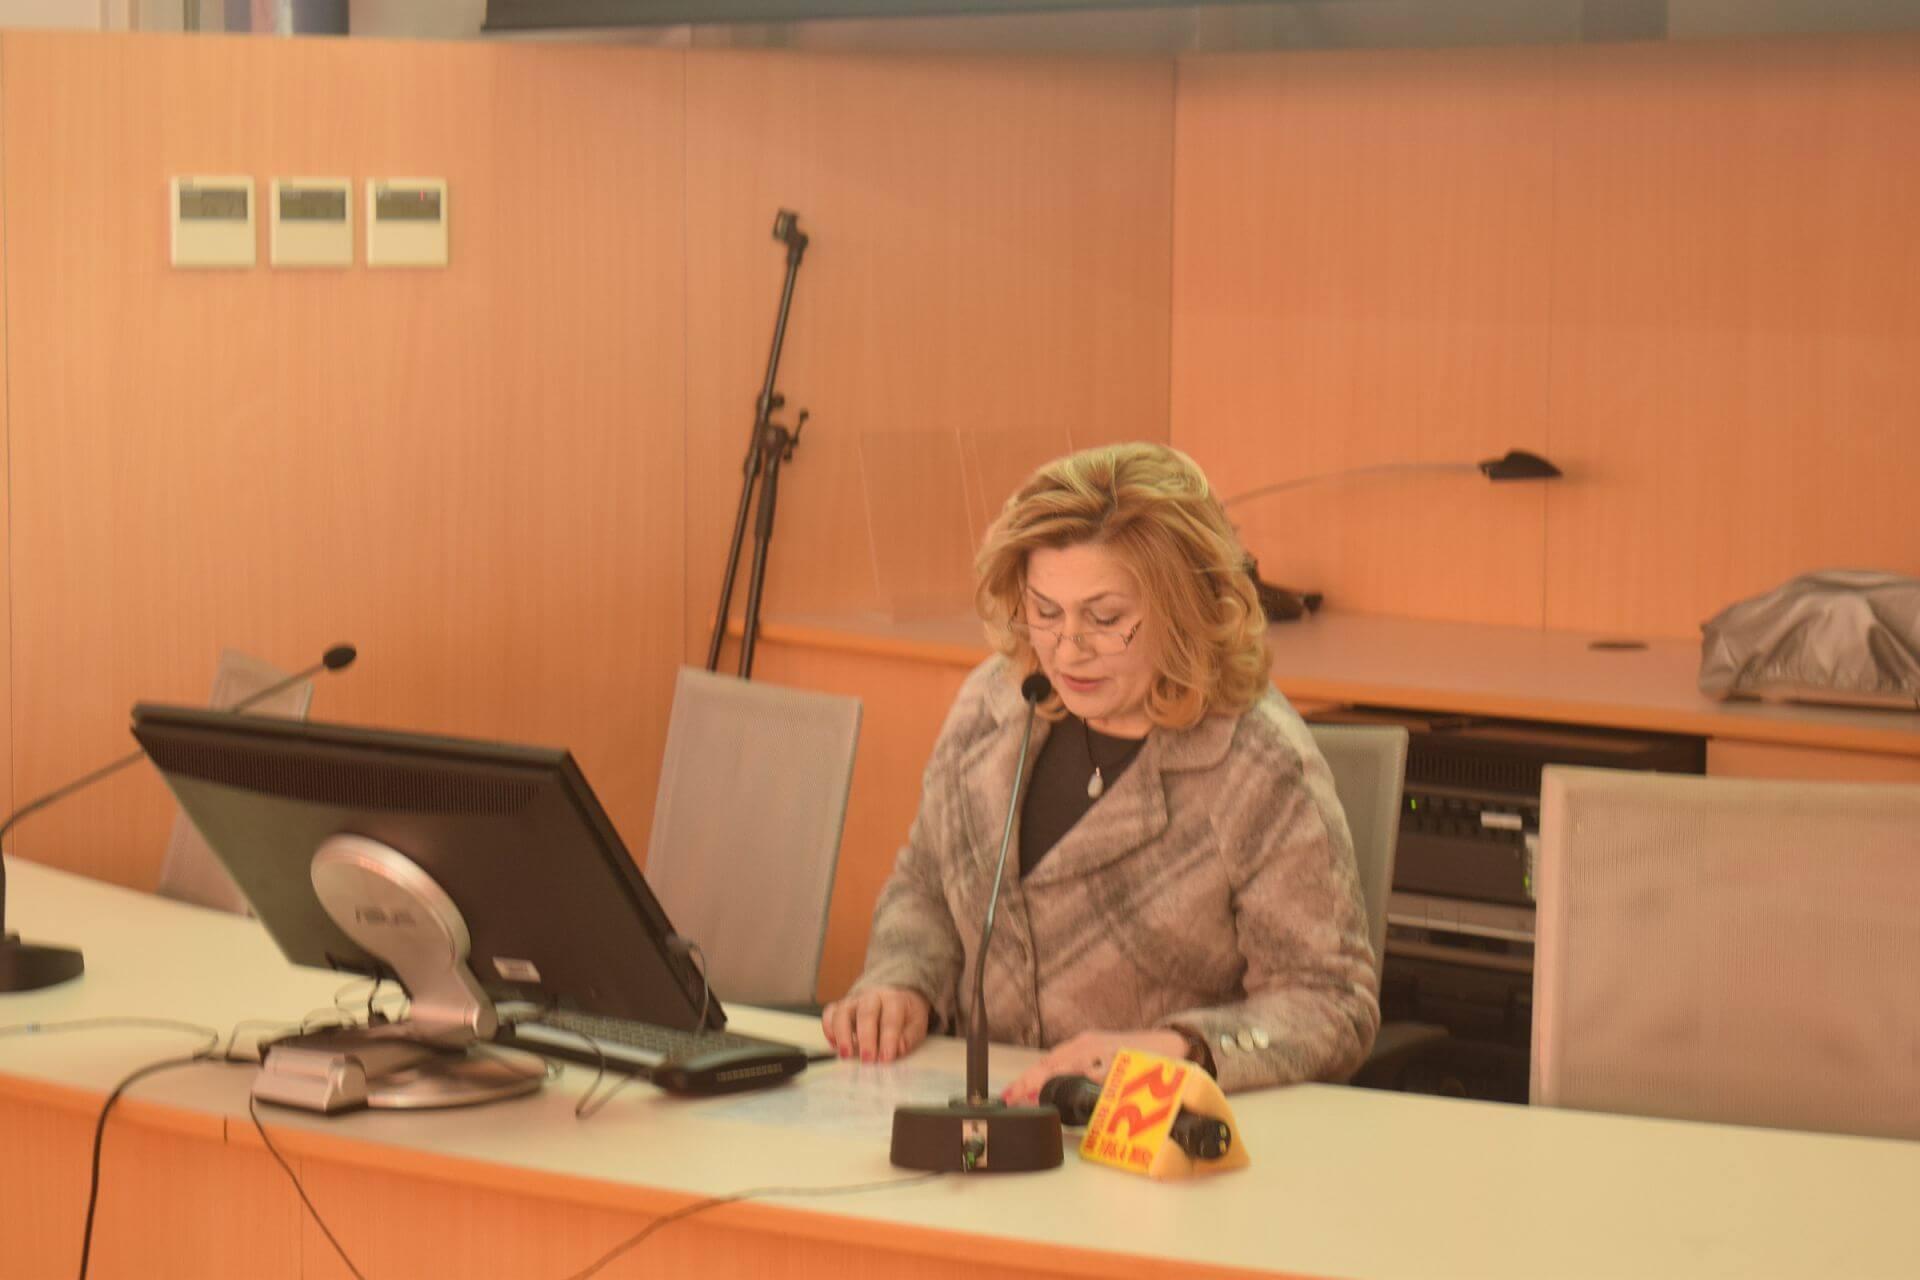 "Glavna ravnateljica NSK dr. sc. Tatijana Petrić na svečanoj proslavi 32. rođendana Nacionalnoga parka Krka predstavila virtualnu izložbu NSK ""Prošlosti i sadašnjost Krke"". Izvor: http://www.np-krka.hr/."